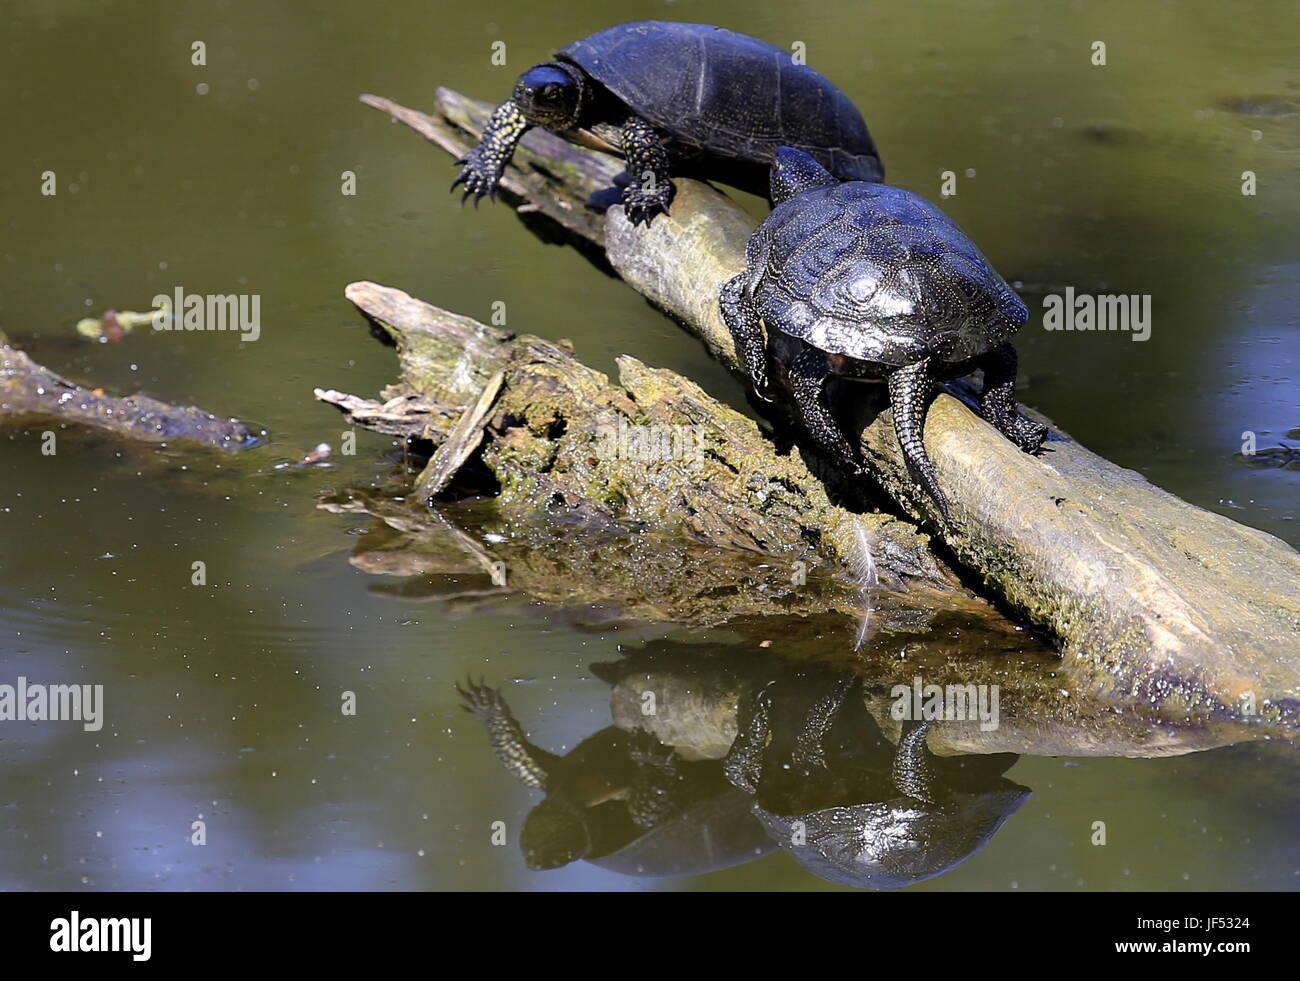 ROSTOV-ON-DON, RUSSIA – JUNE 28, 2017: European pond turtles at the Rostov-on-Don Zoo. Valery Matytsin/TASS - Stock Image